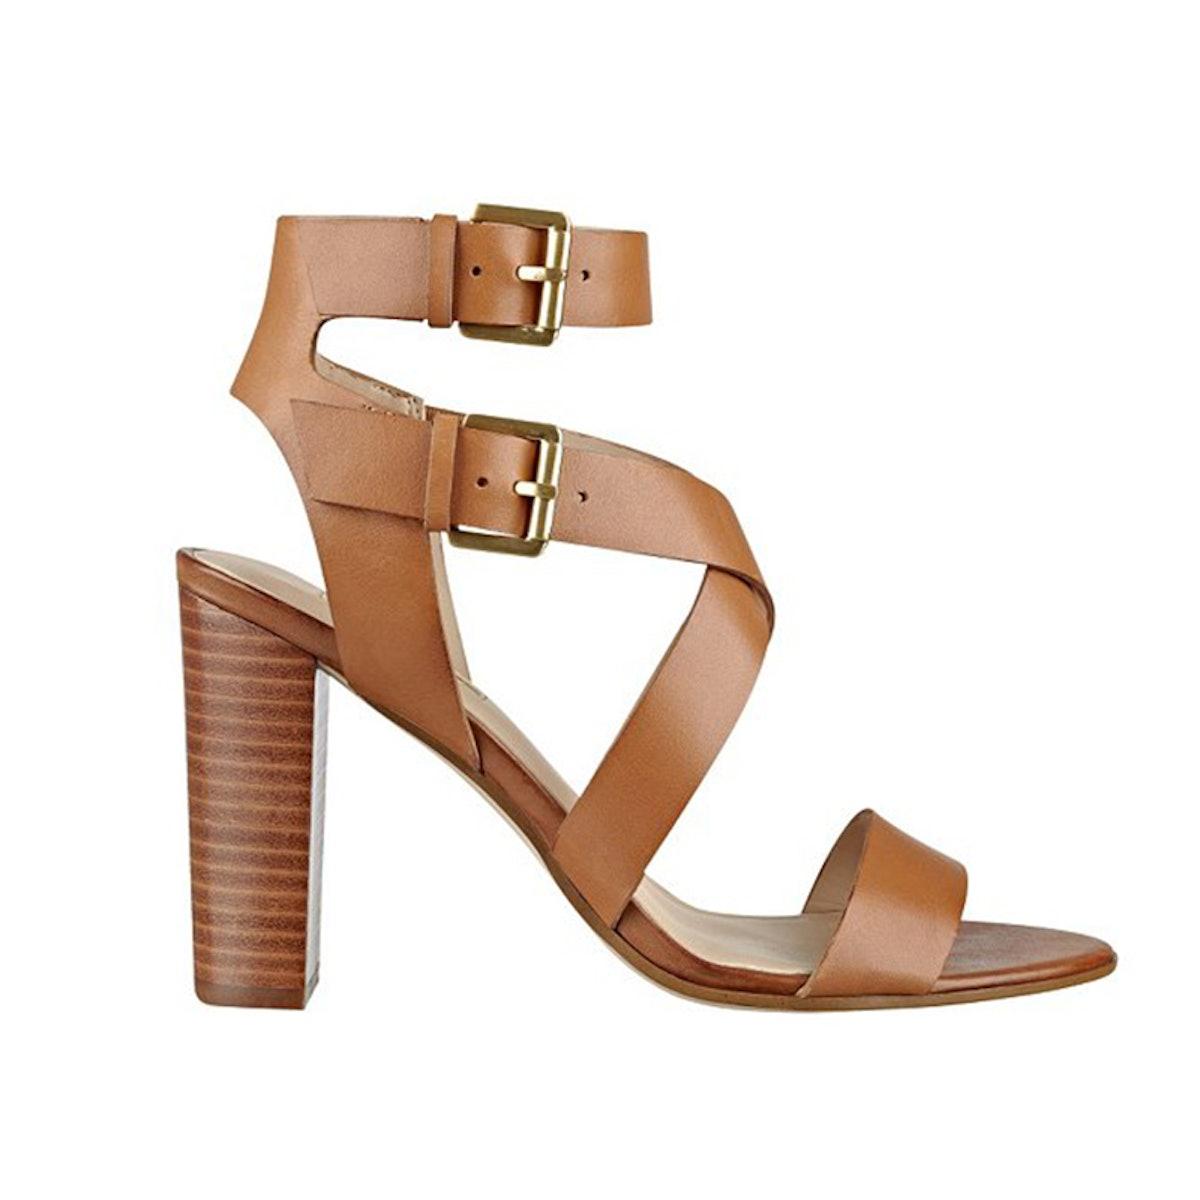 Bressa City Sandals